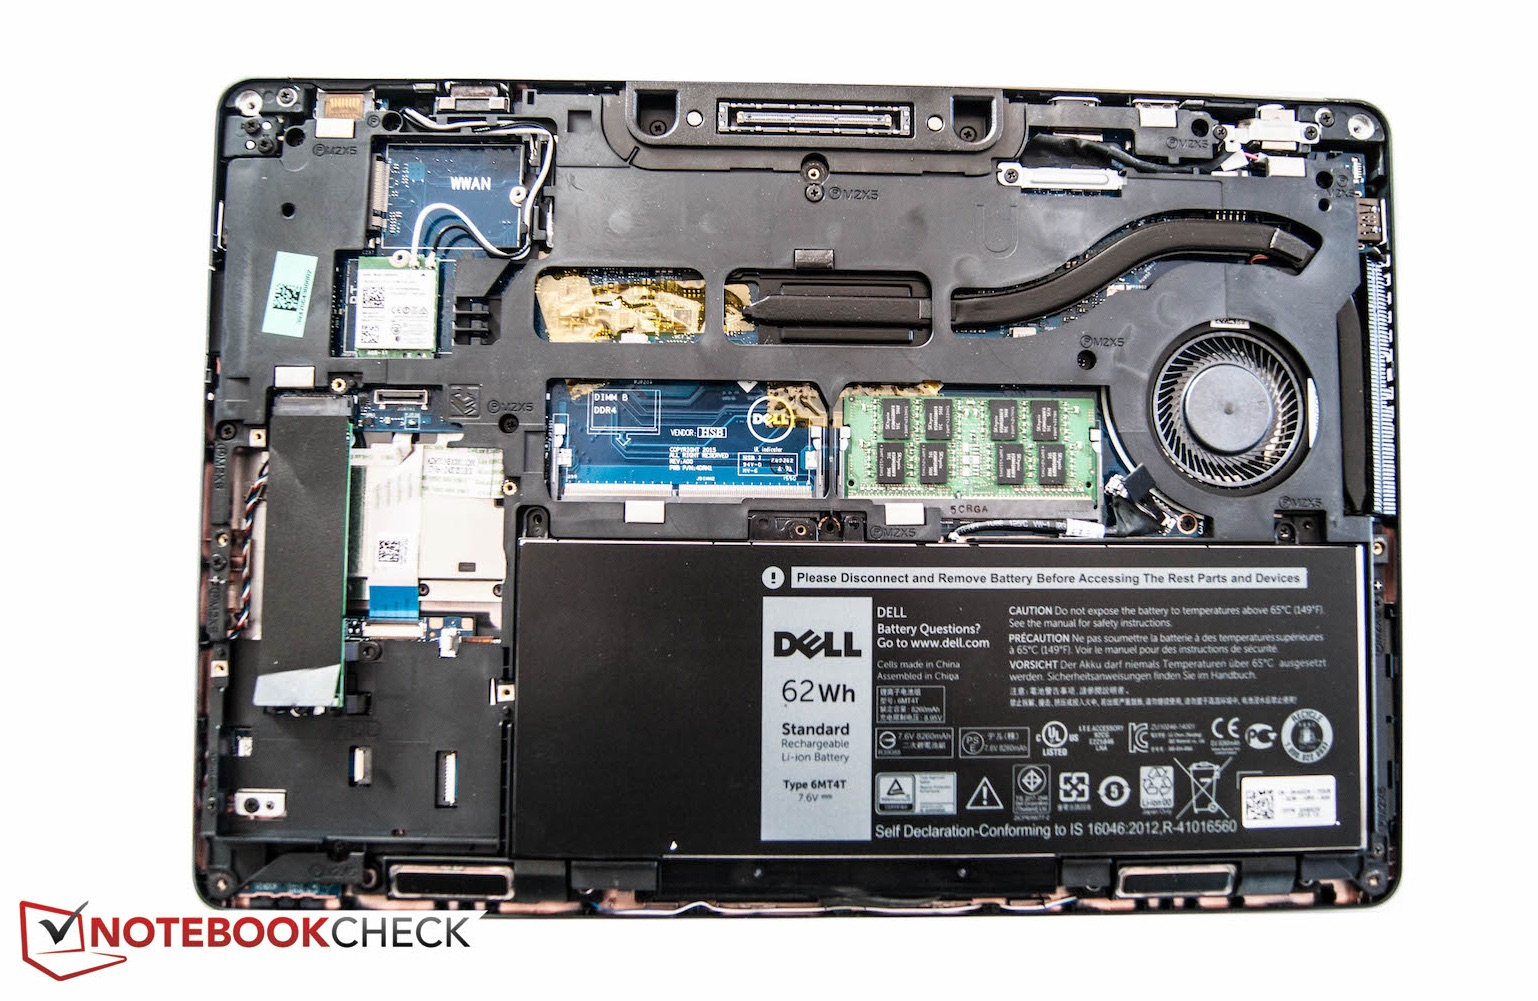 Dell Latitude 14 E5470 Notebook Review Notebookcheck Net